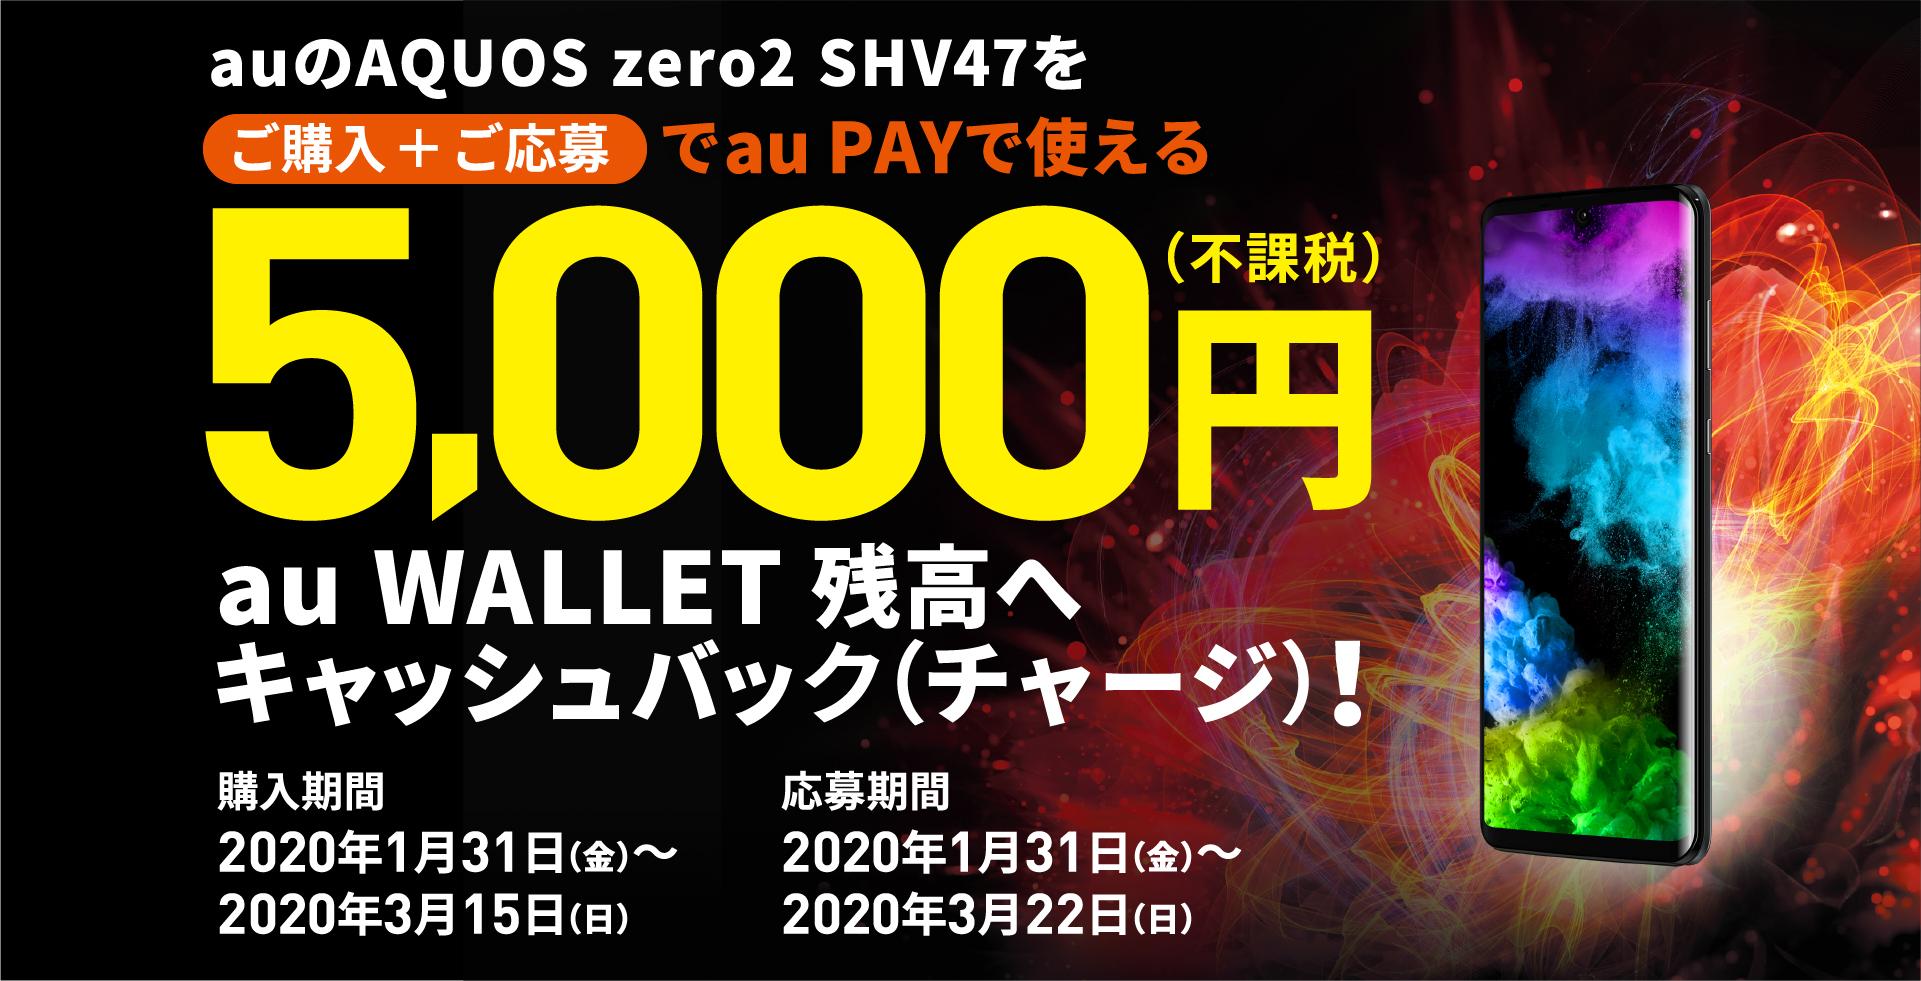 au AQUOS zero2 SHV47 au WALLET残高へ 5,000円キャッシュバック